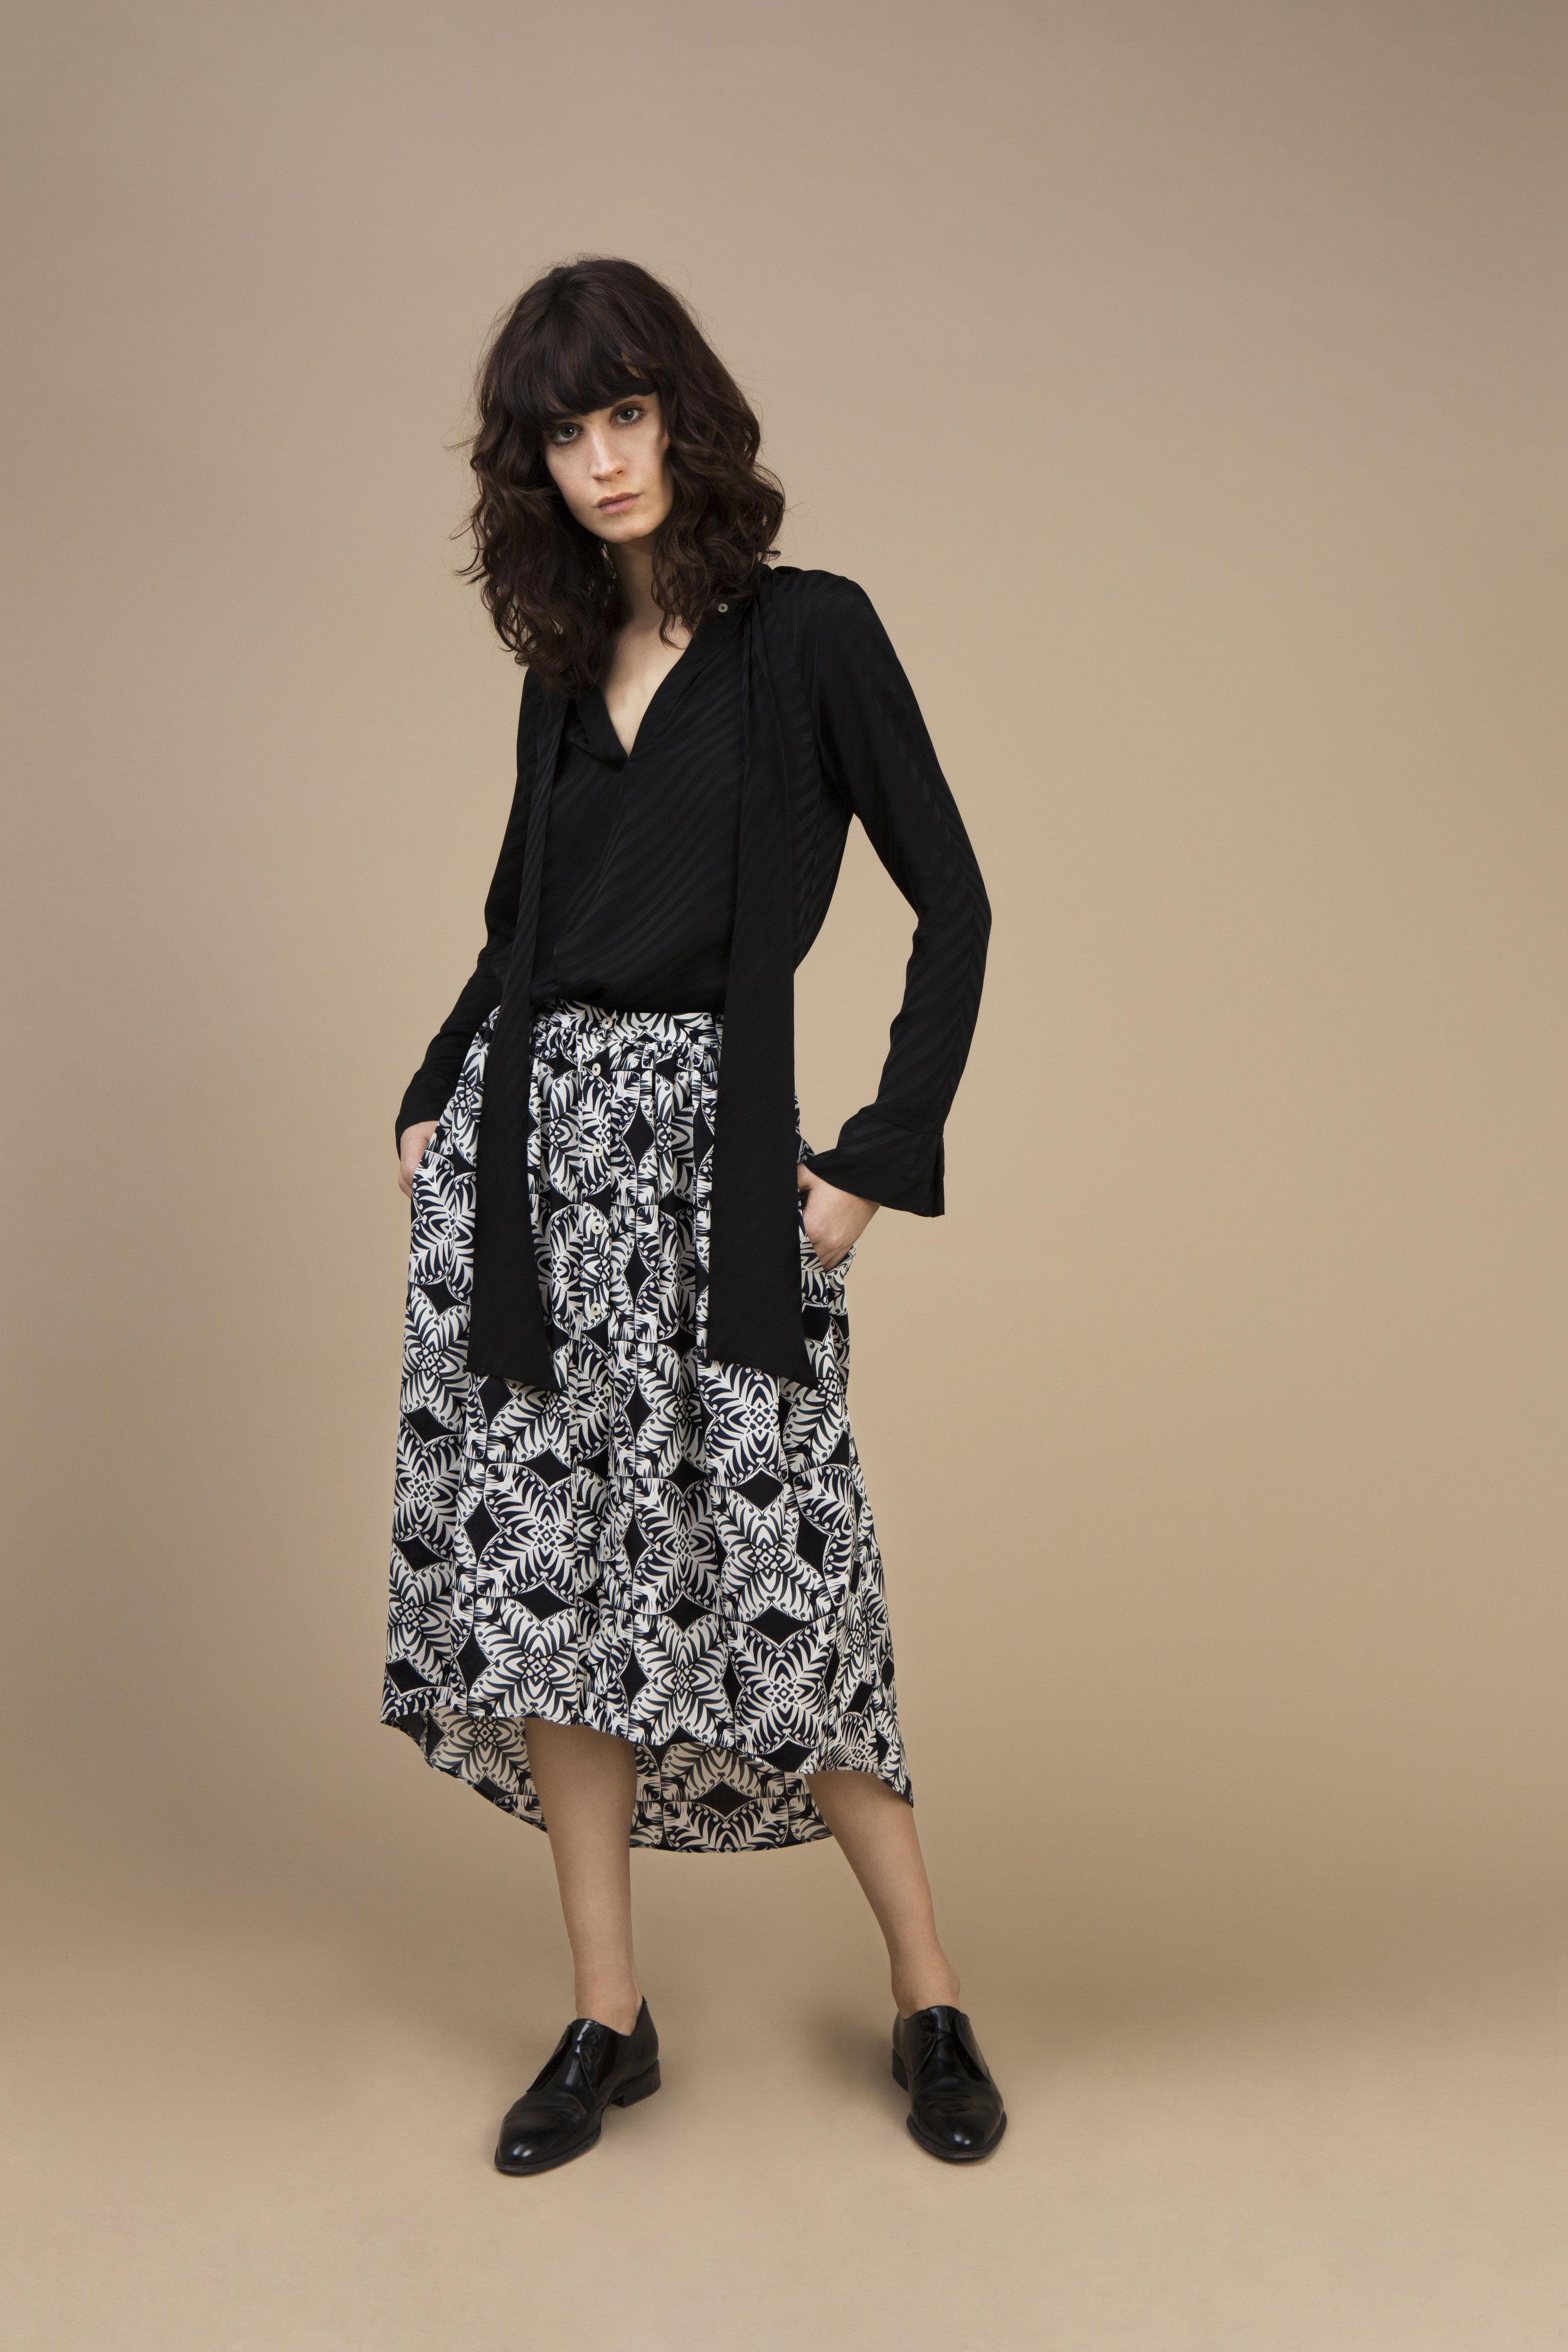 Crepe satin silk Ascot top - stripy black and crepe silk Long and asymmetric skirt — Kaleidoscope